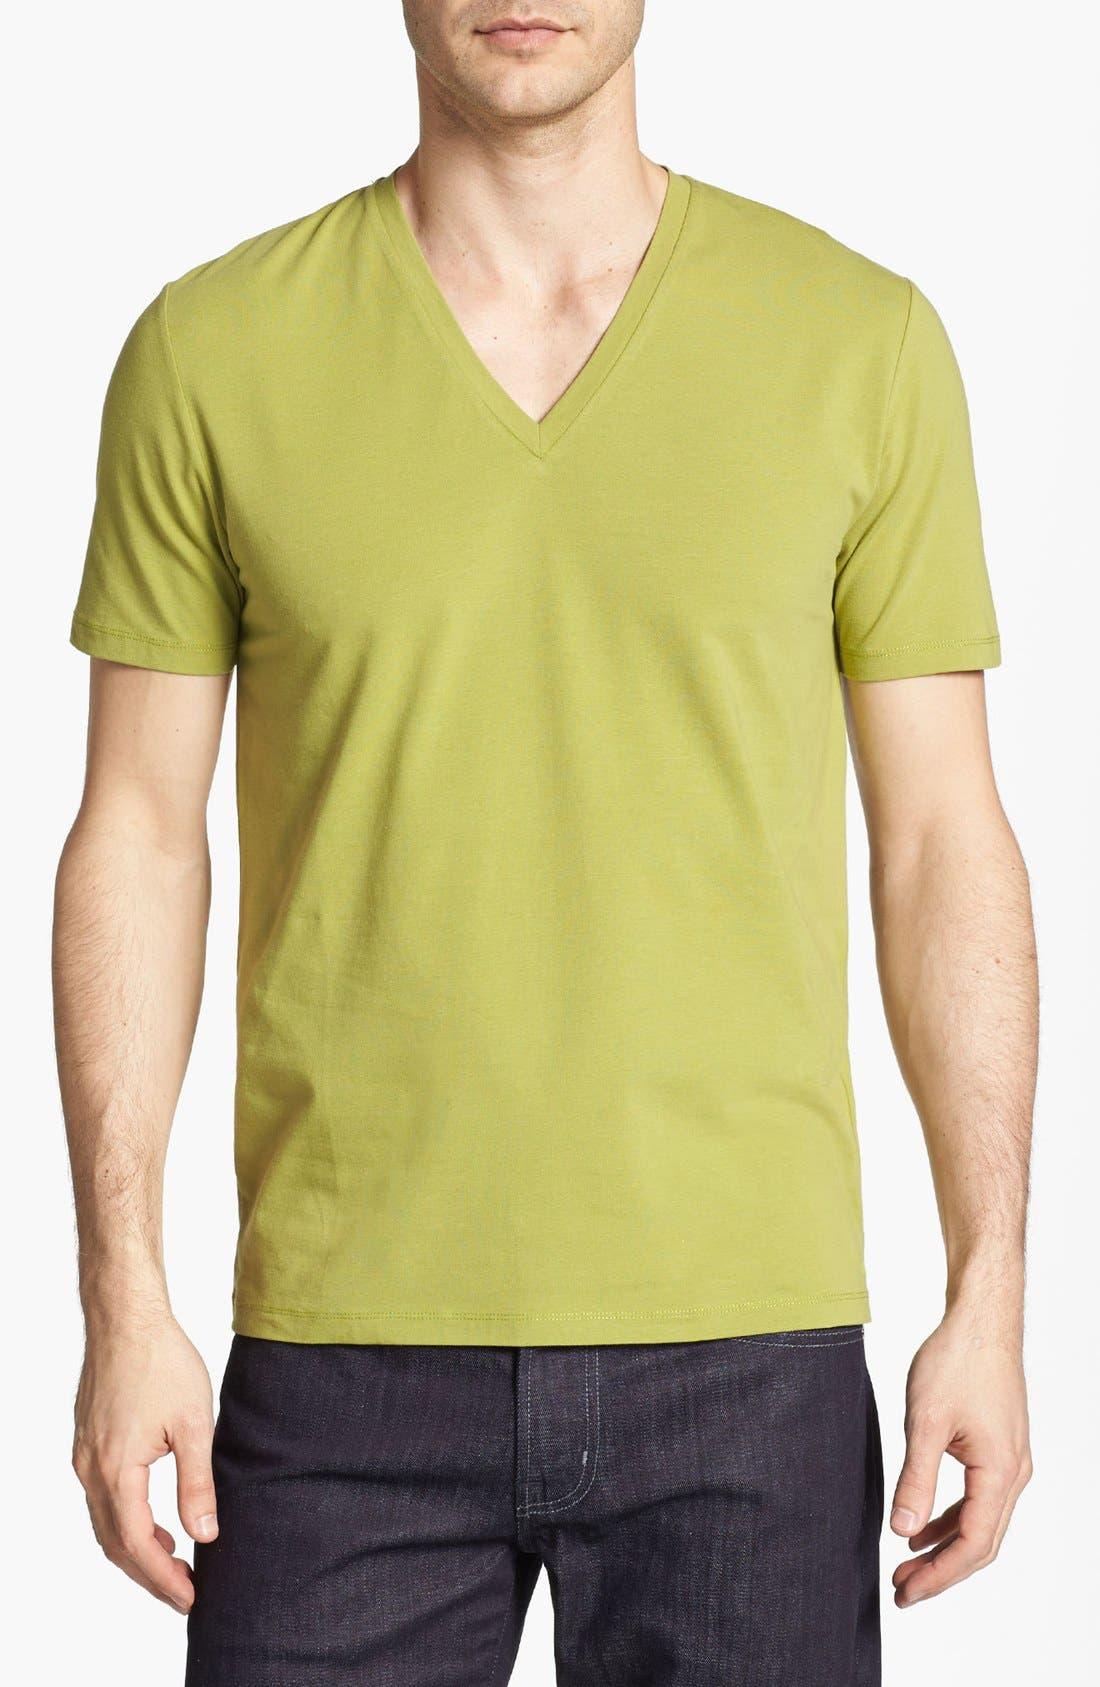 Alternate Image 1 Selected - HUGO 'Dredoso' V-Neck T-Shirt